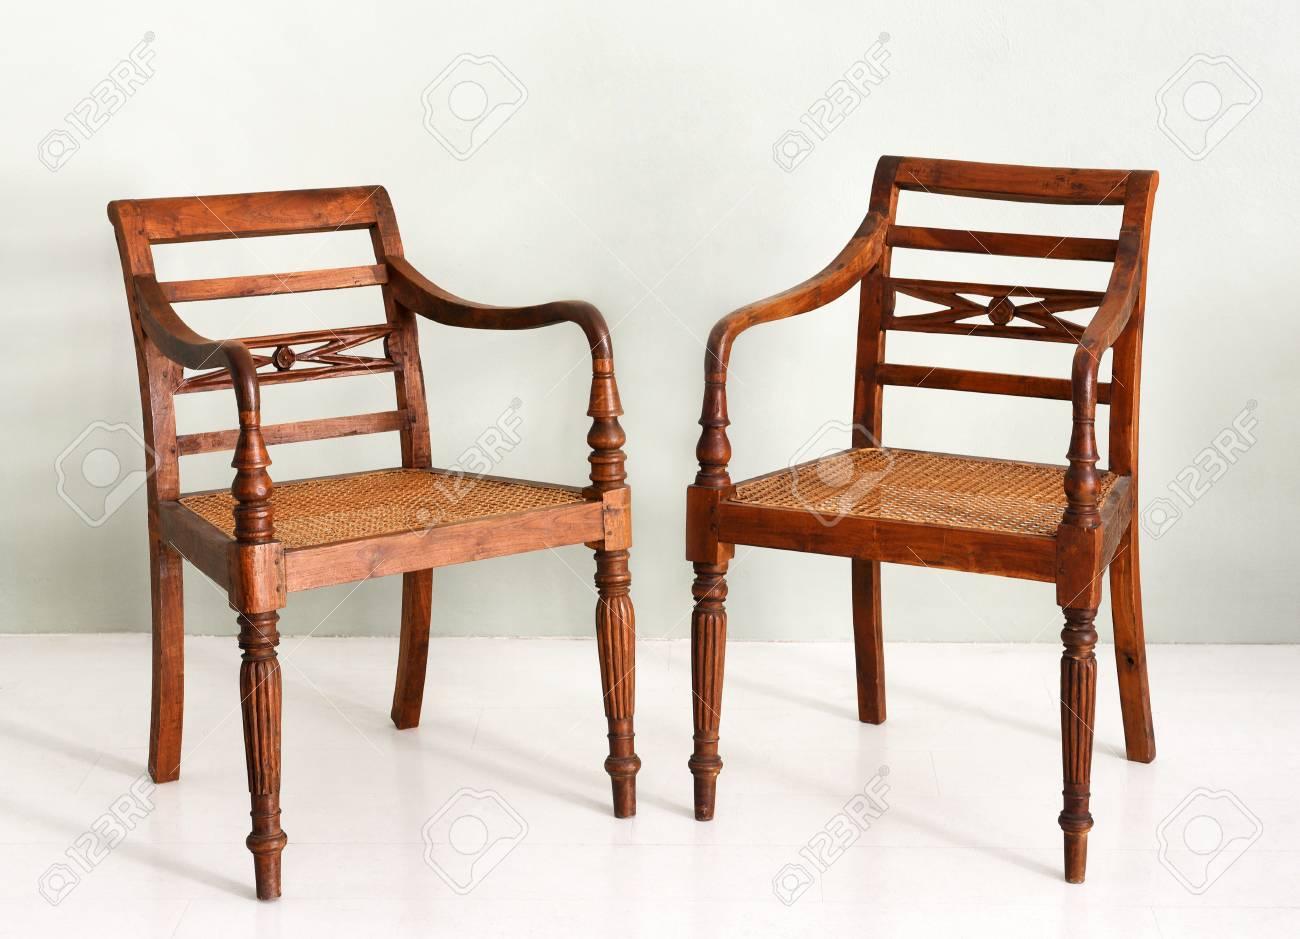 Dos sillones de madera de estilo colonial con patas giratorias y asientos  de mimbre o de caña, posiblemente servidores de un juego de comedor